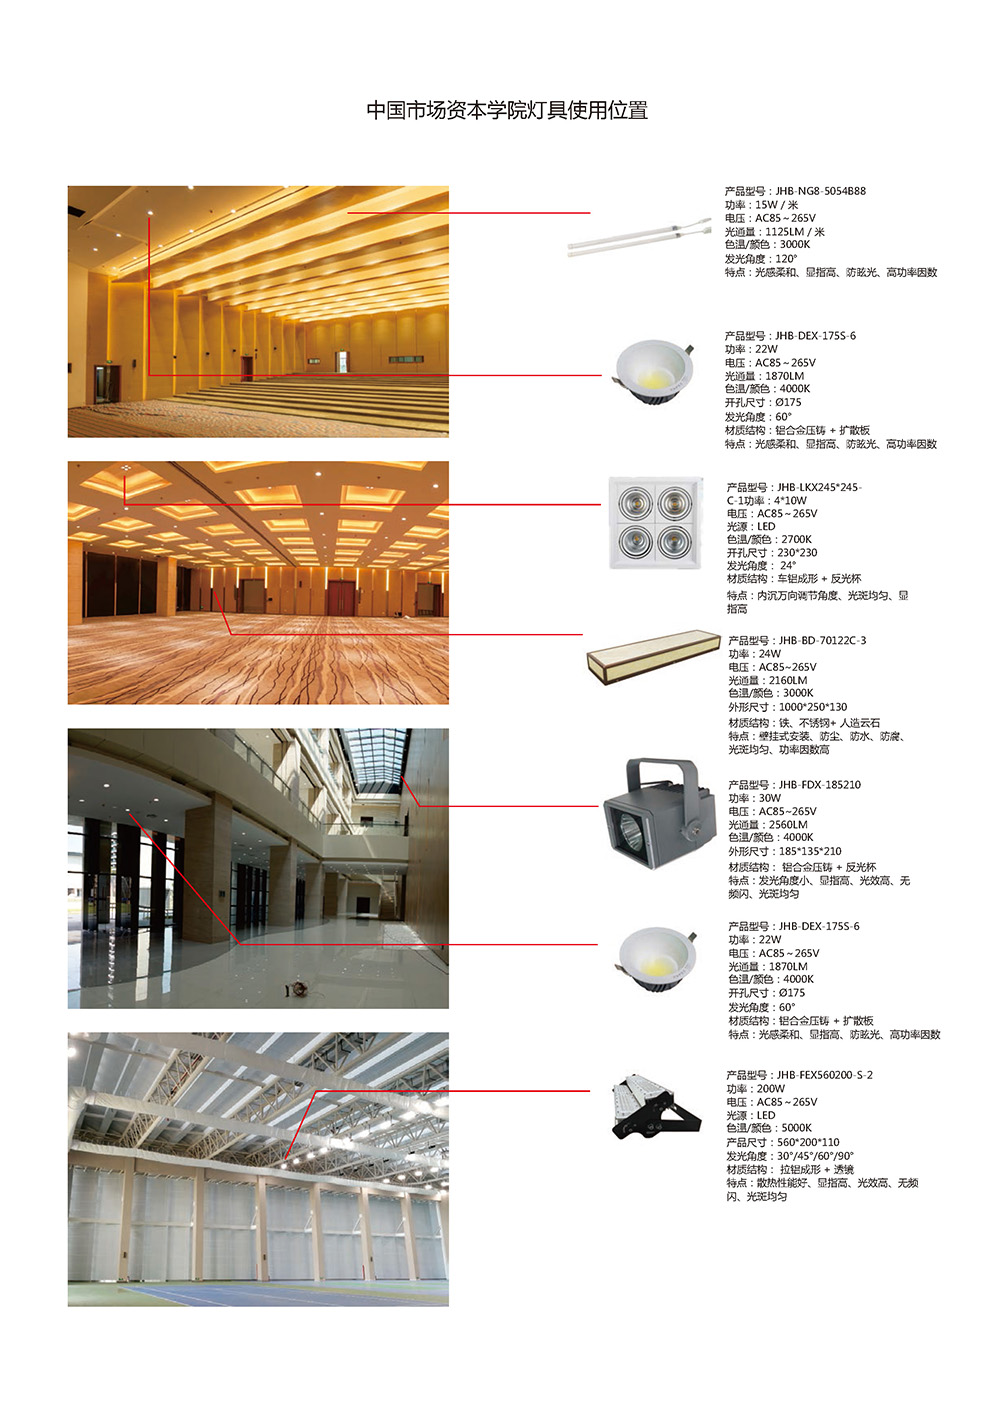 JPEG-1资本学院_页面_1